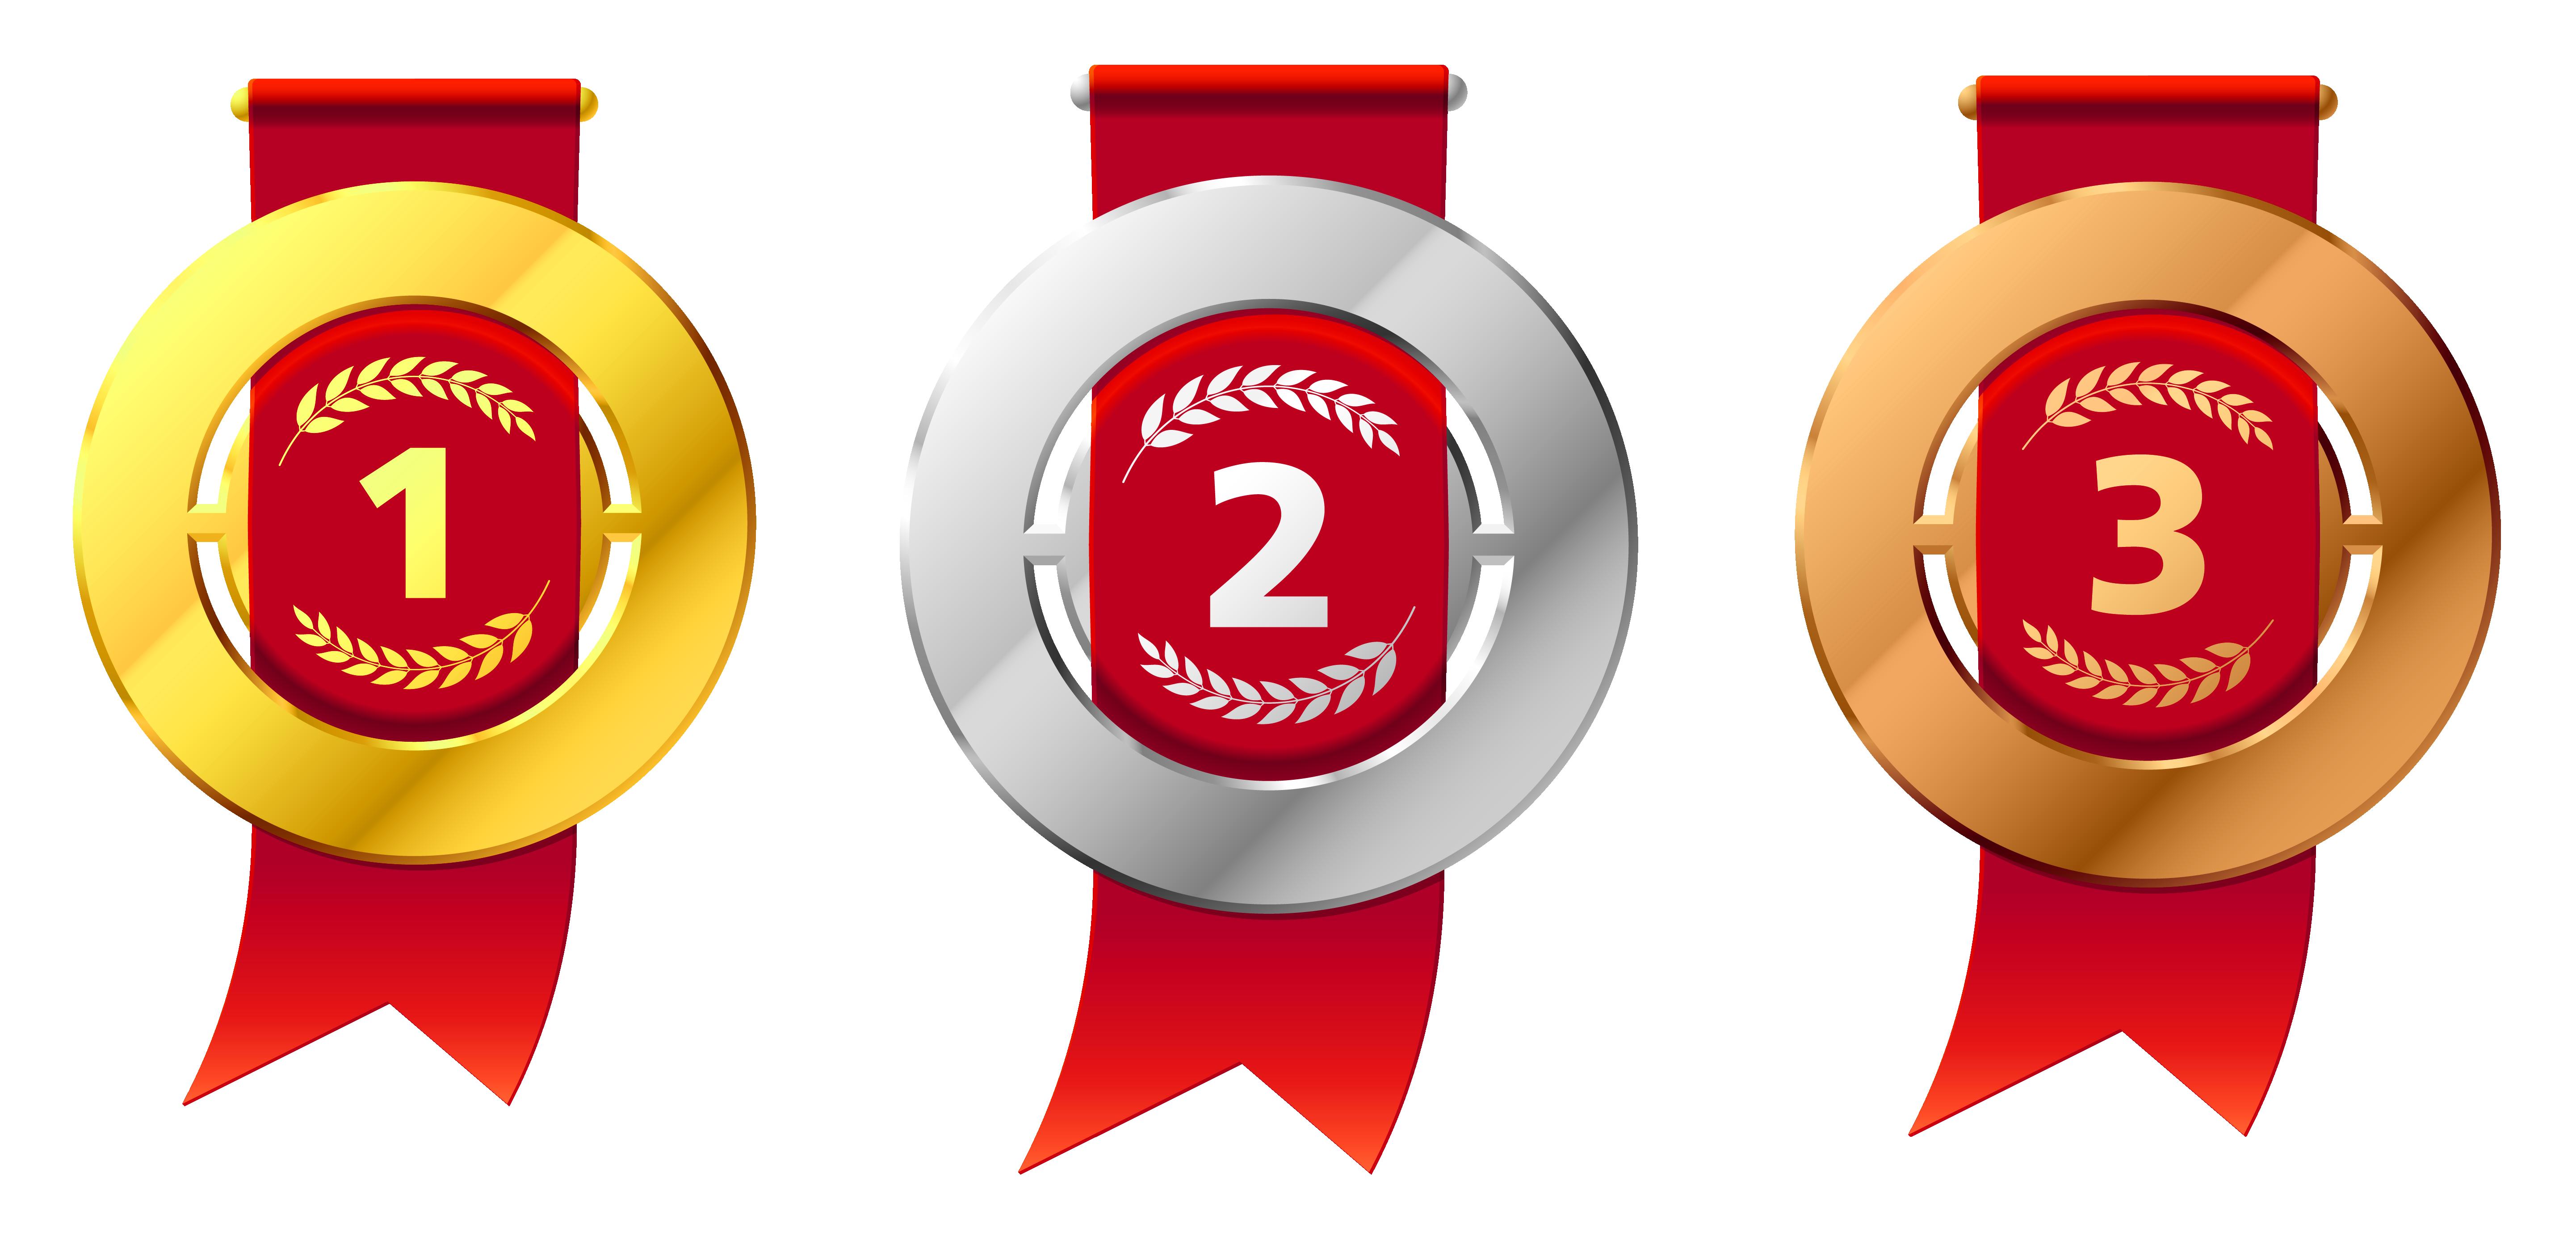 Medals Clipart Png.